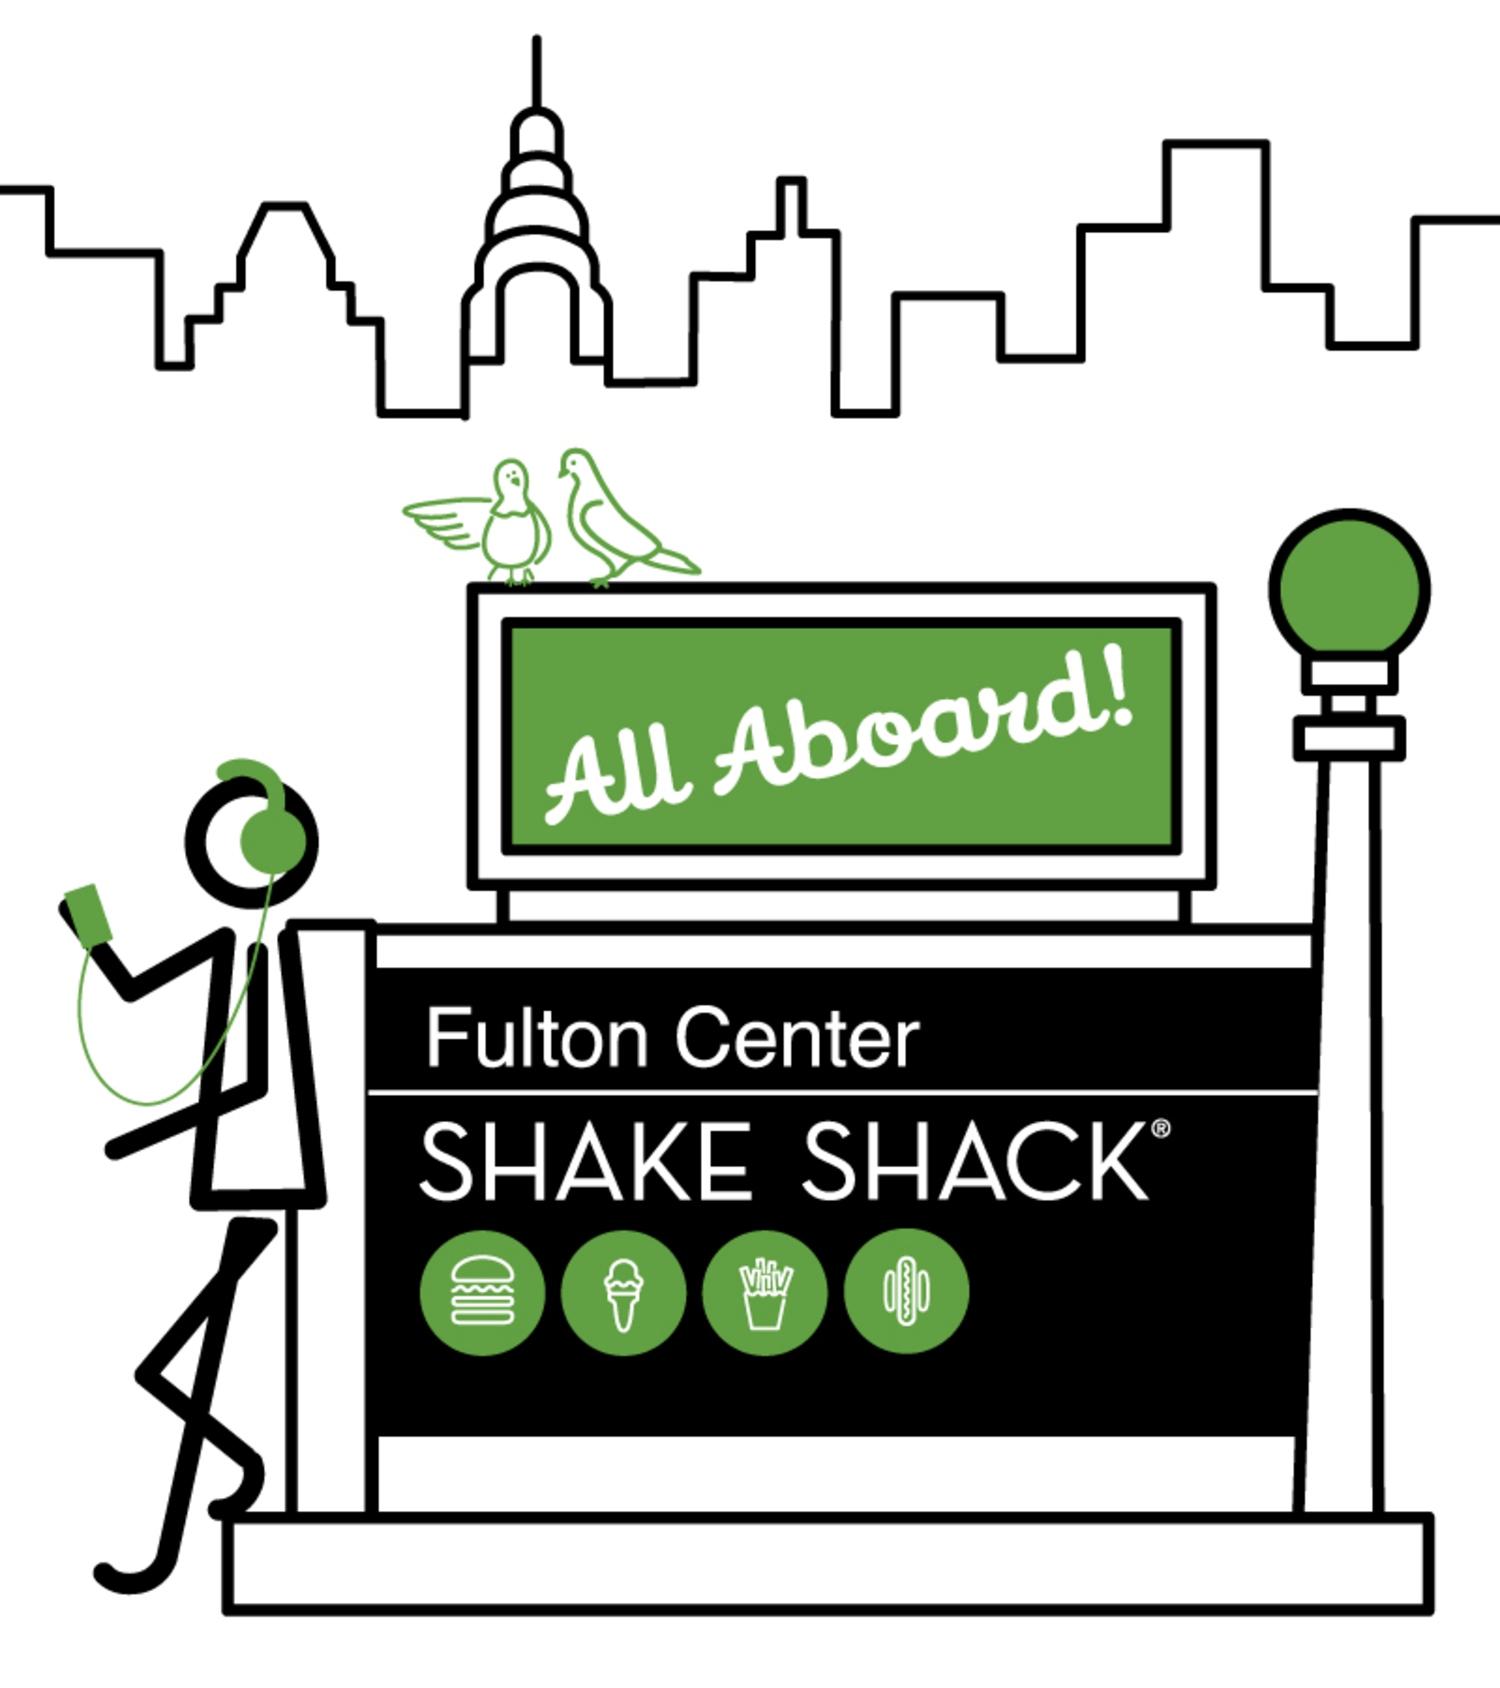 Fulton Center to Get Shake Shack in 2016